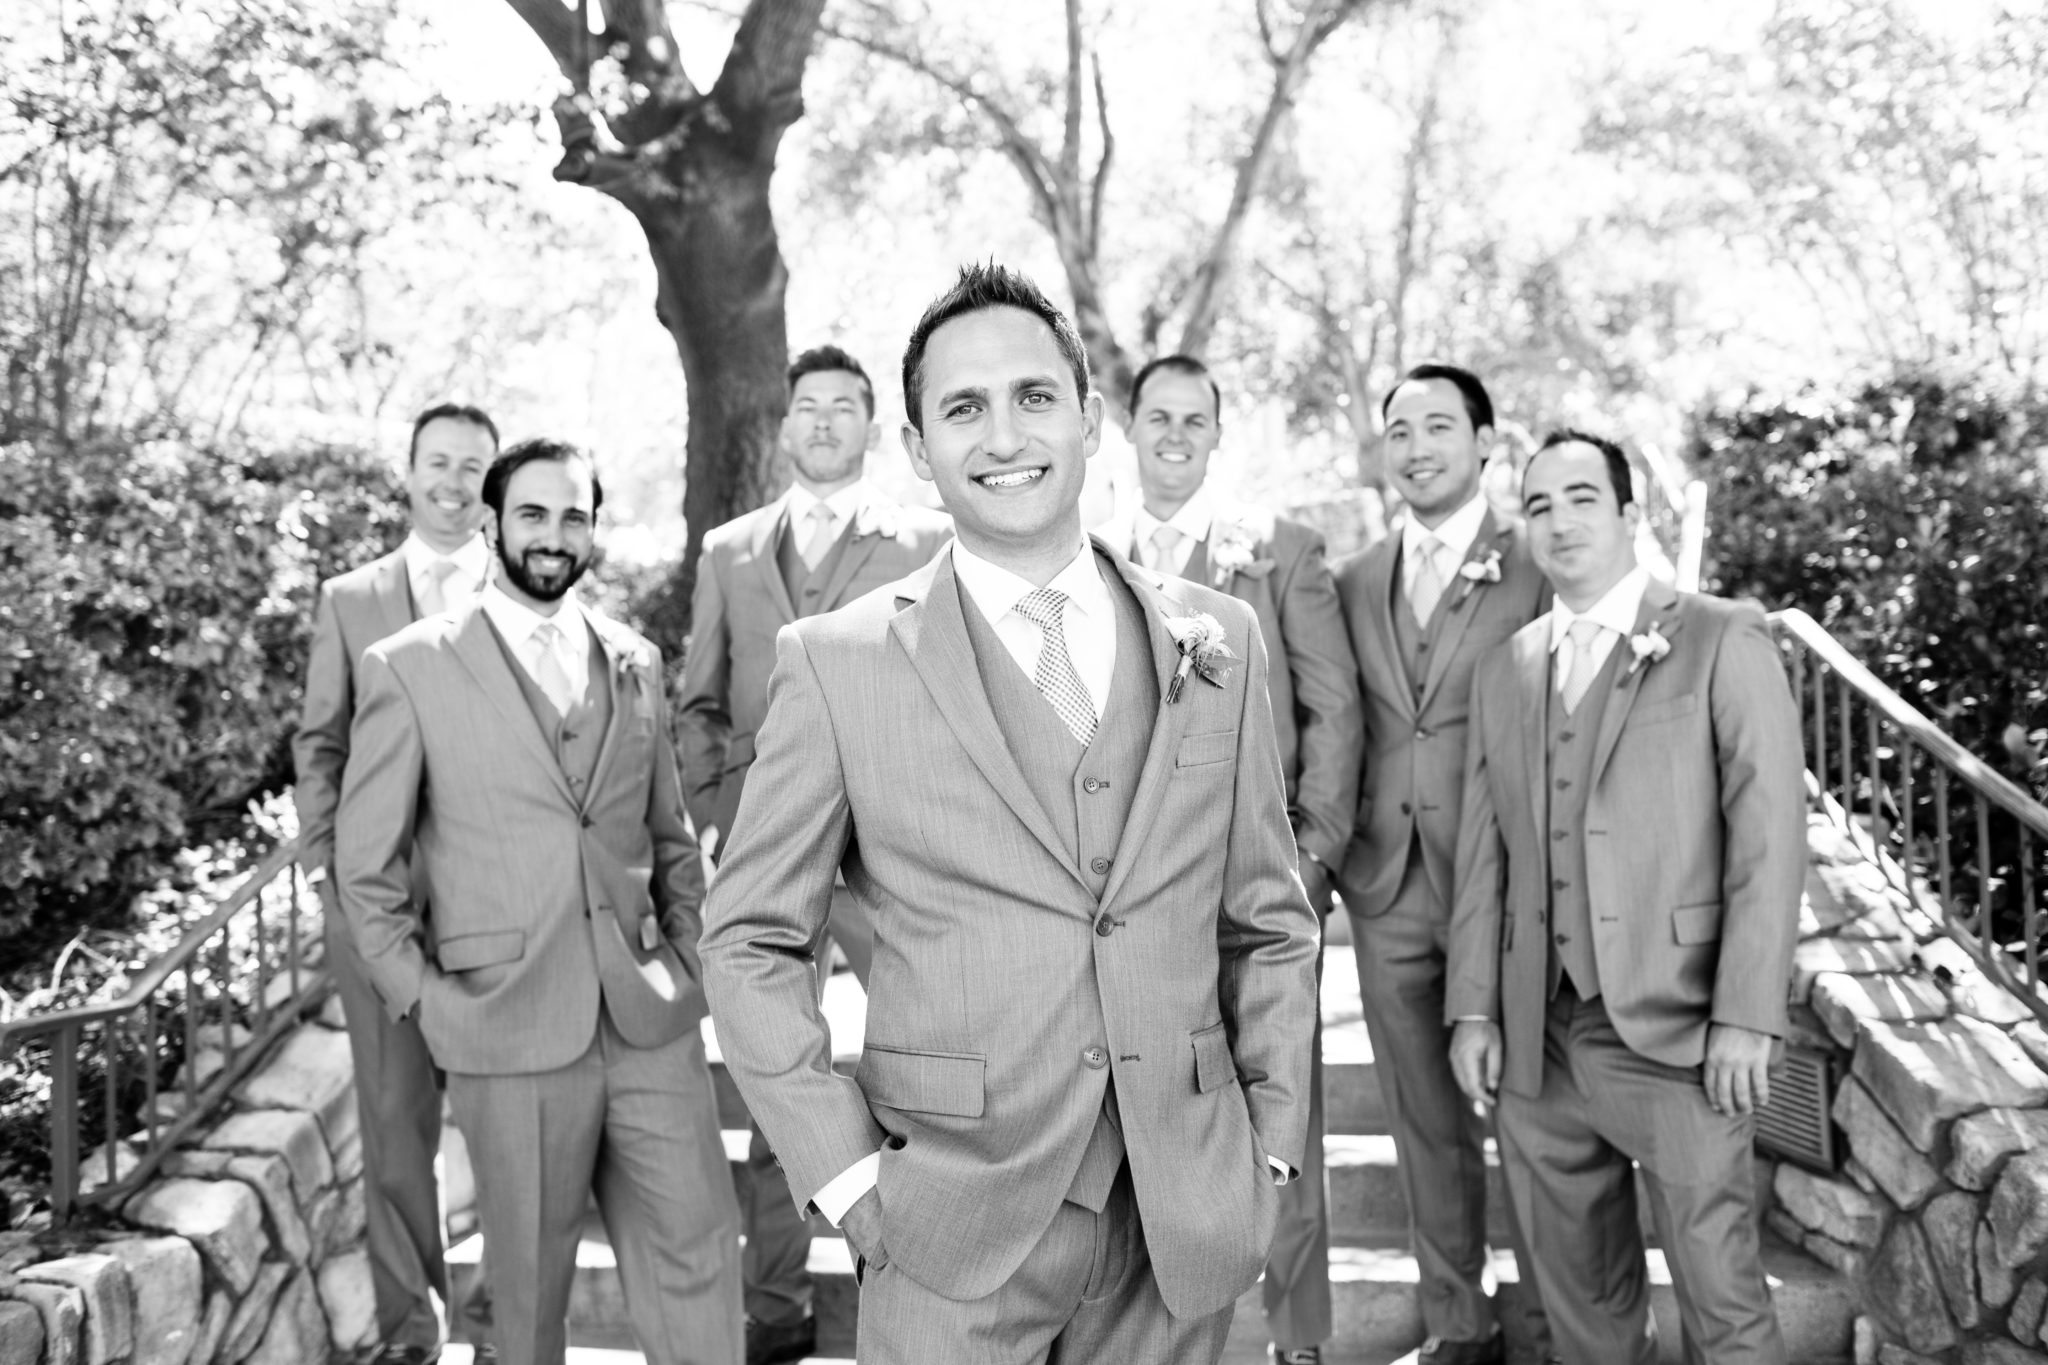 Temecula_Creek_Inn_Wedding_026.jpg